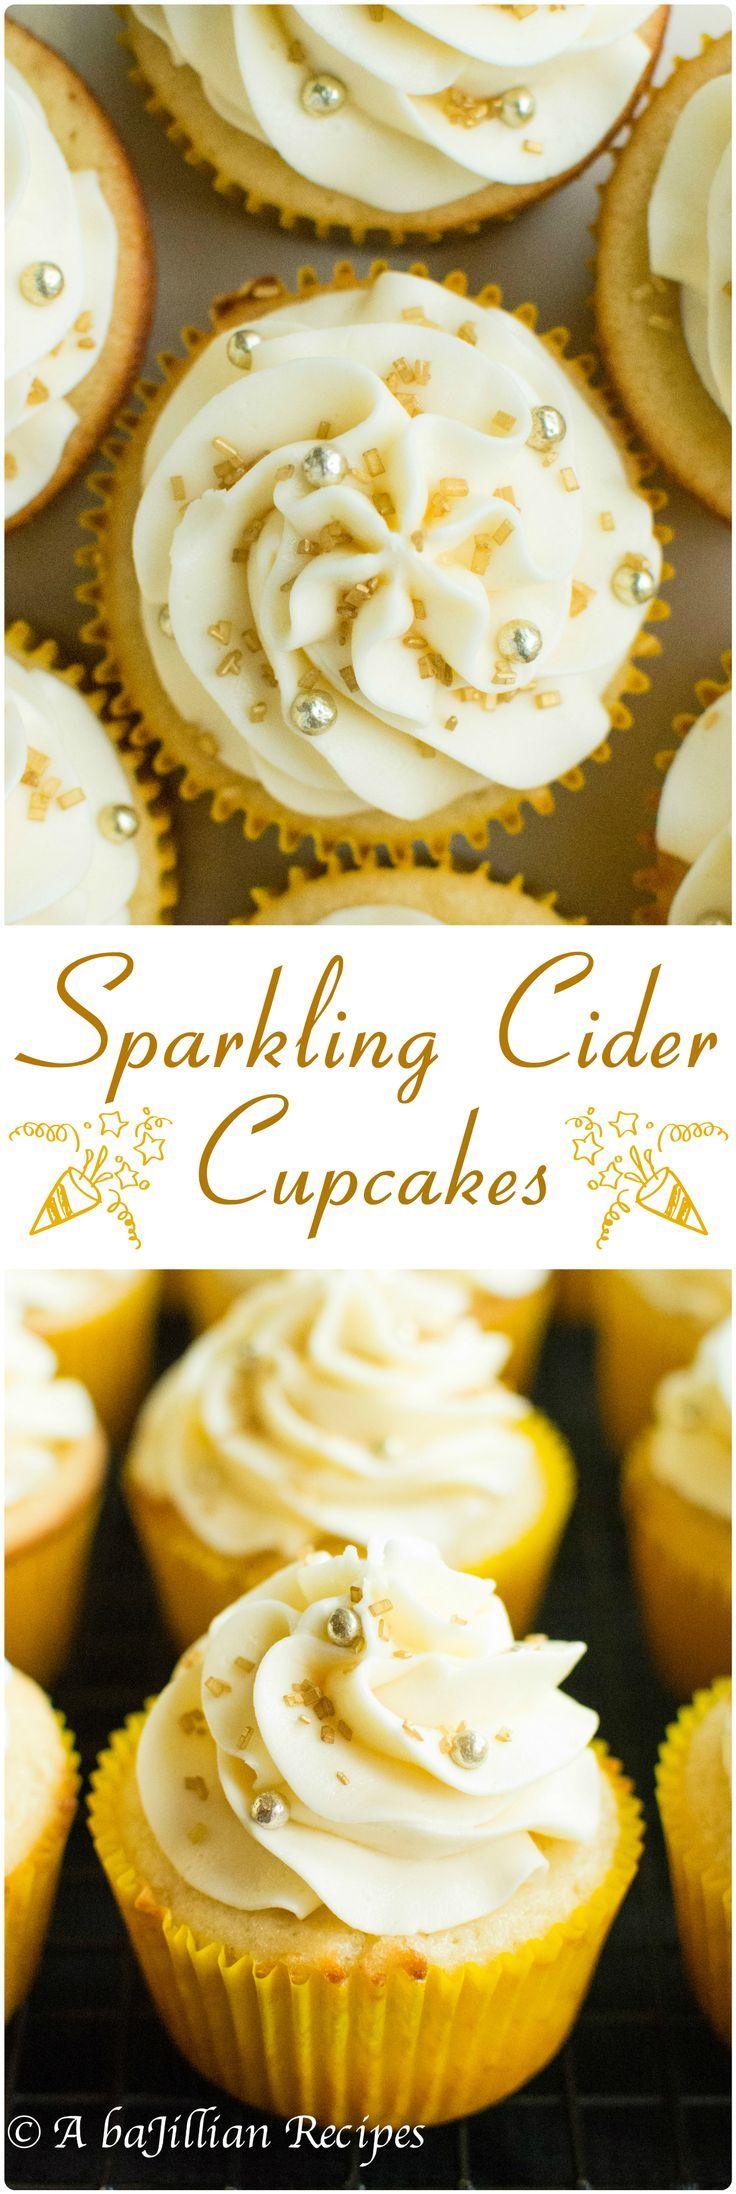 Sparkling Cider Cupcakes